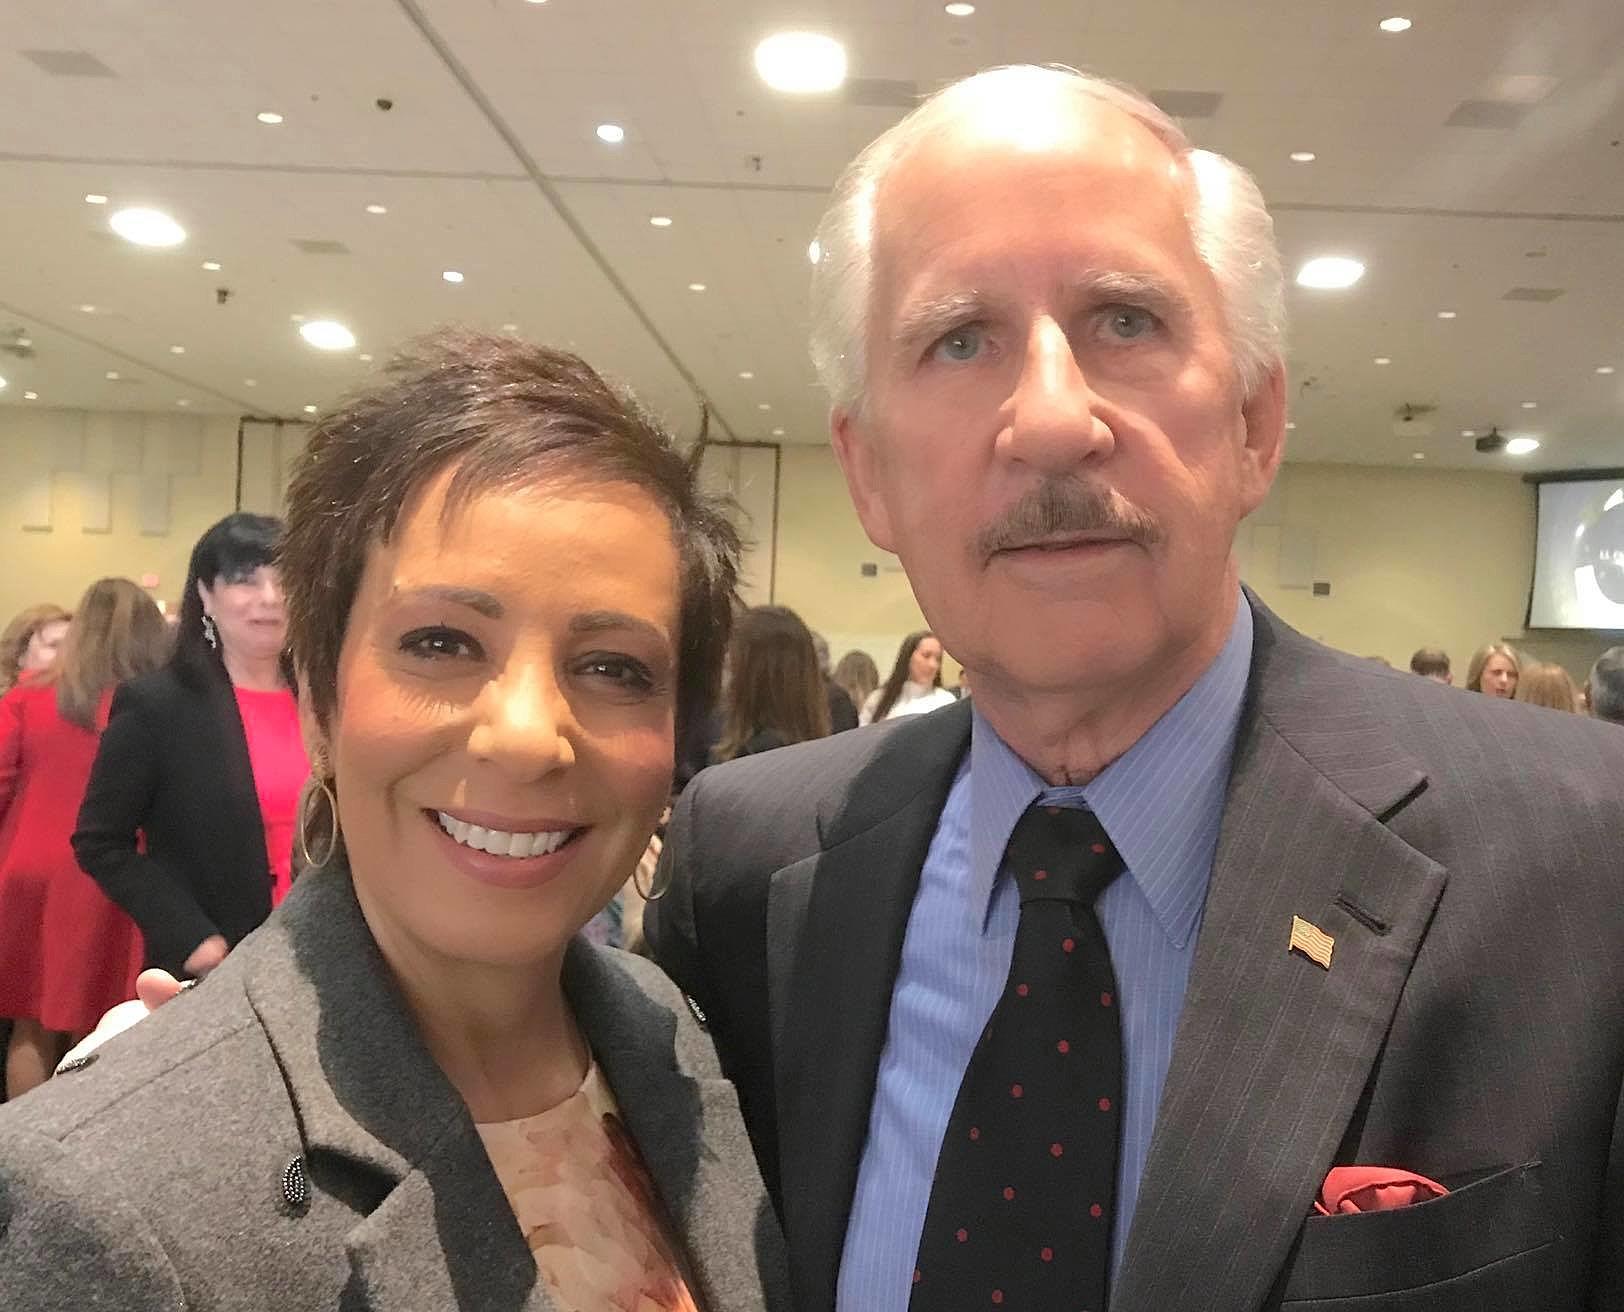 Gary and Estela Together Again - Former Co-Anchors Reunite